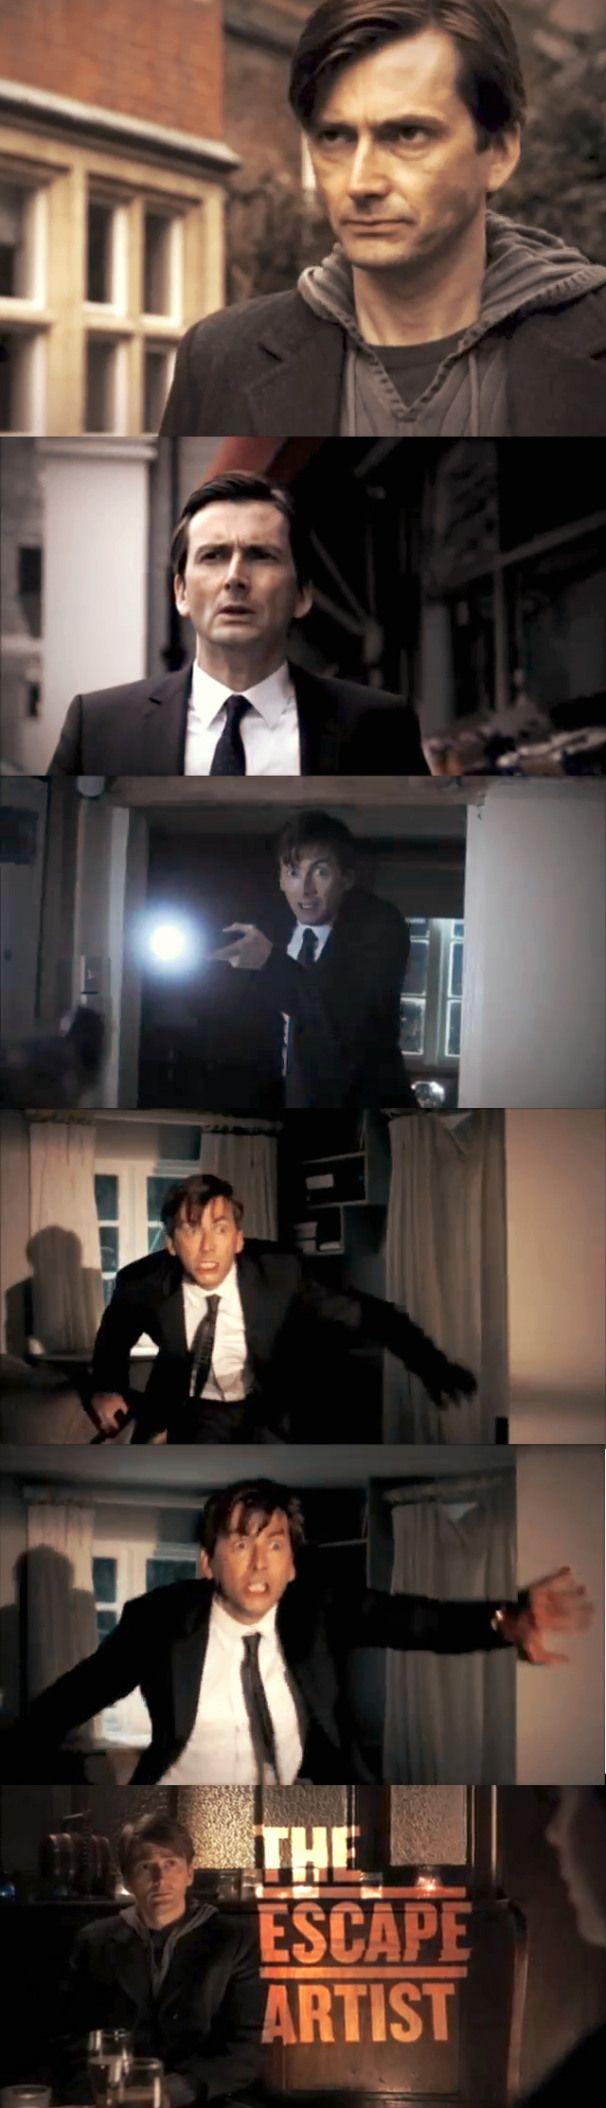 The Escape Artist First pics of the NEW Original BBC